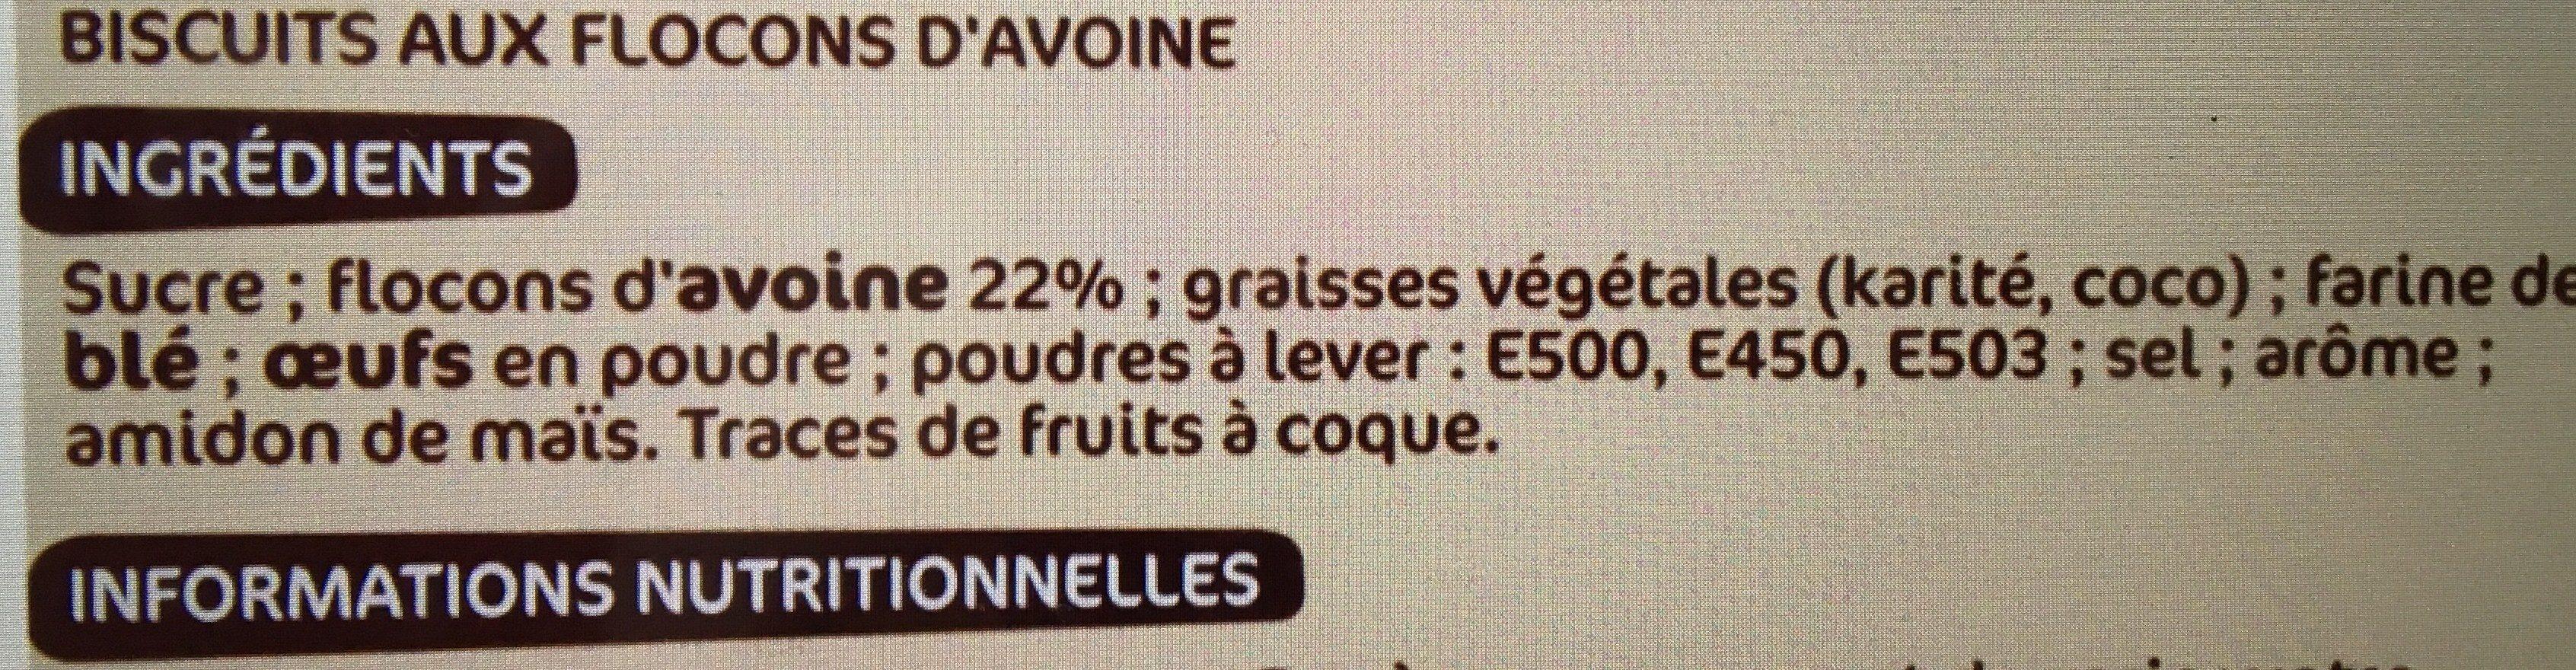 Galettes suedoises flocon avoine - Ingredients